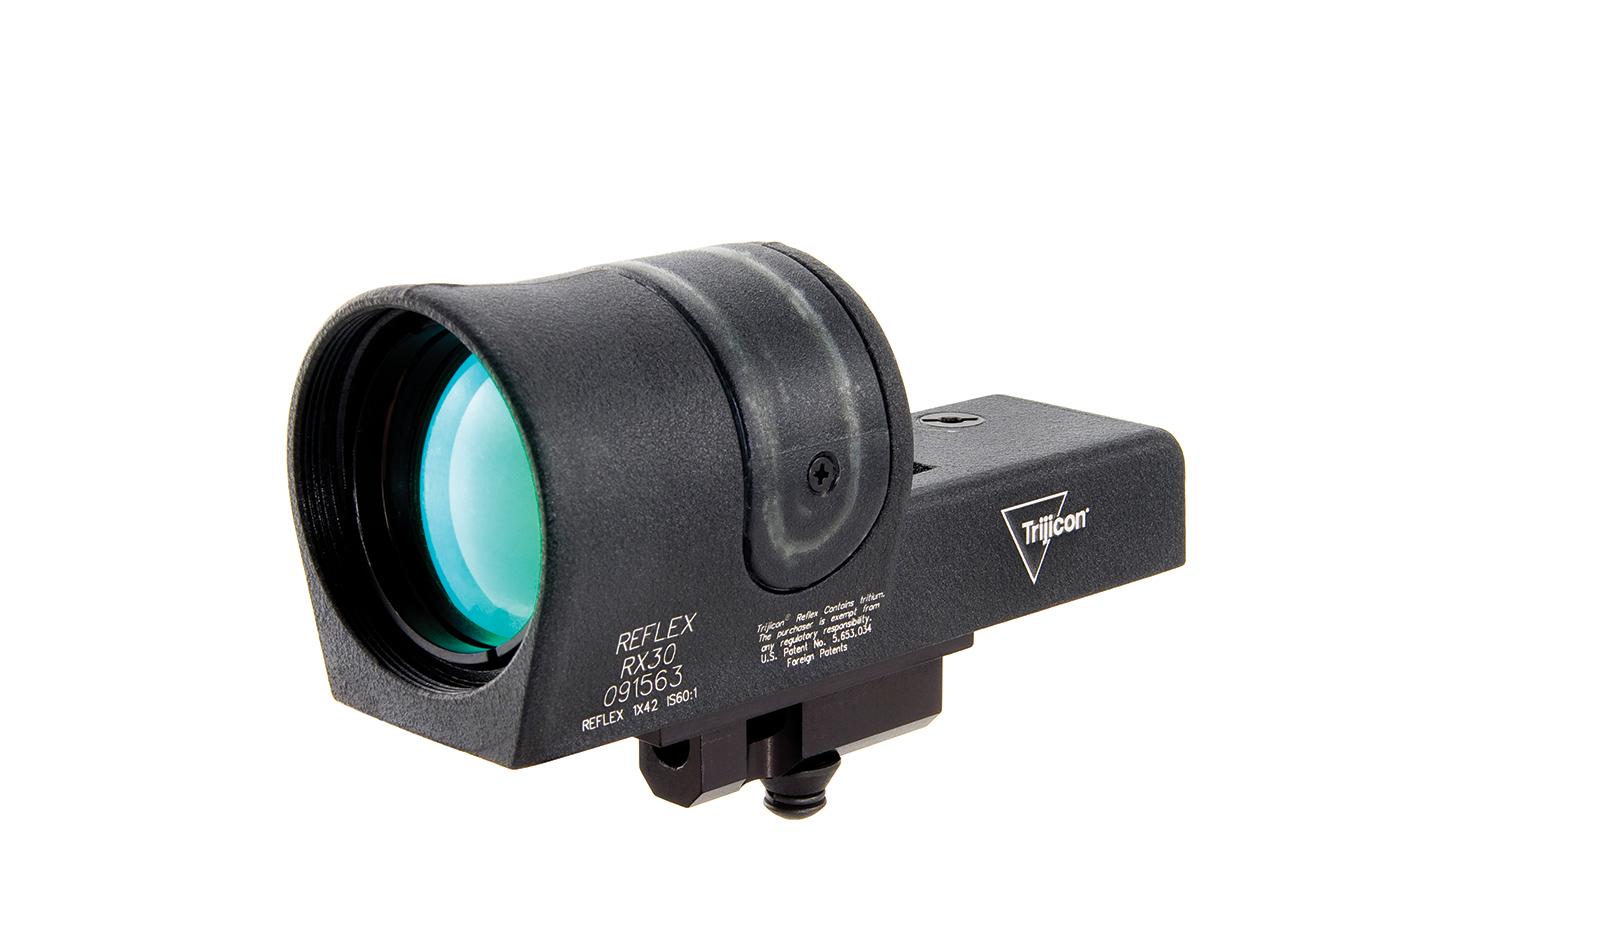 RX30-25 angle